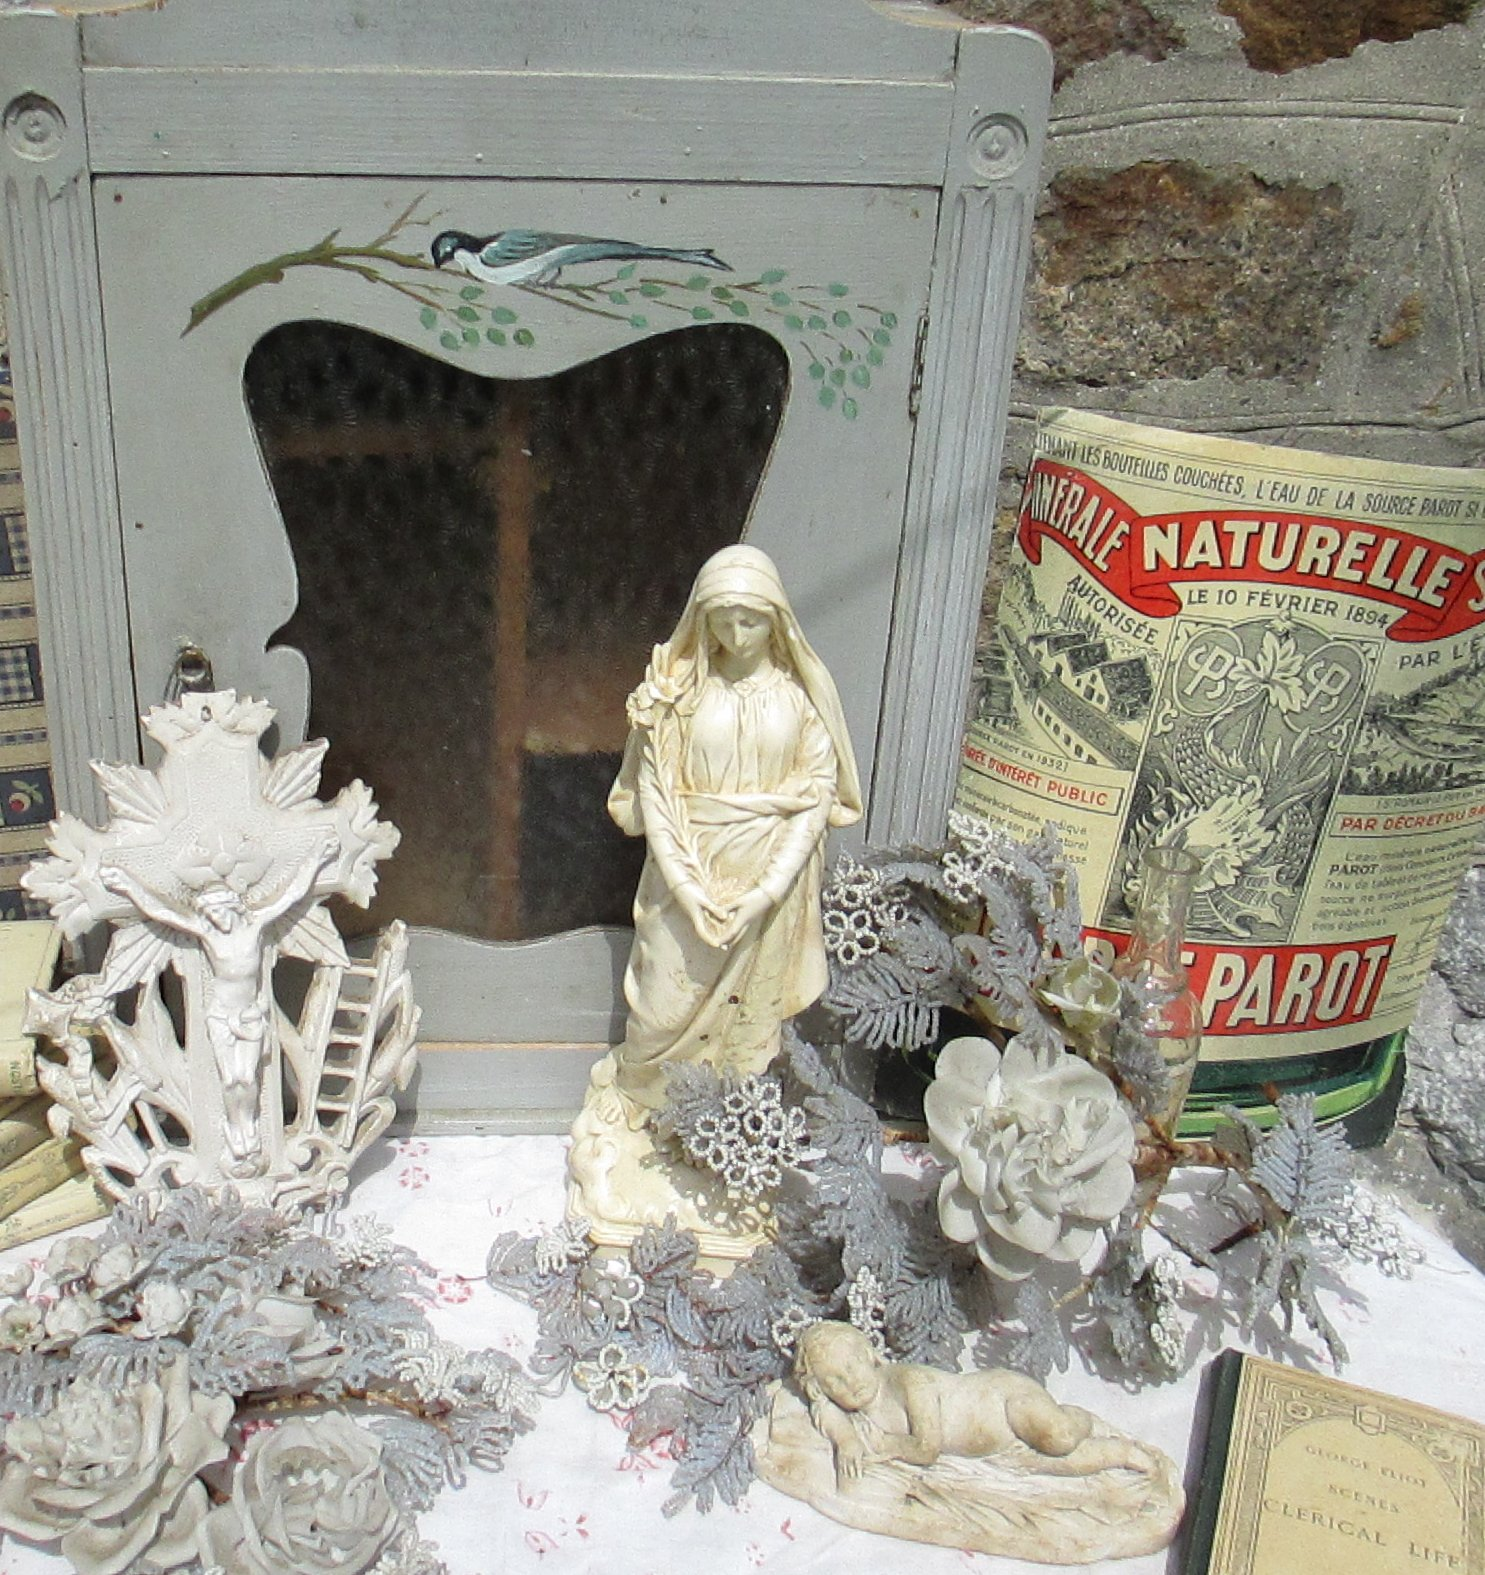 The iacf Newark Antiques and Collectors Fair